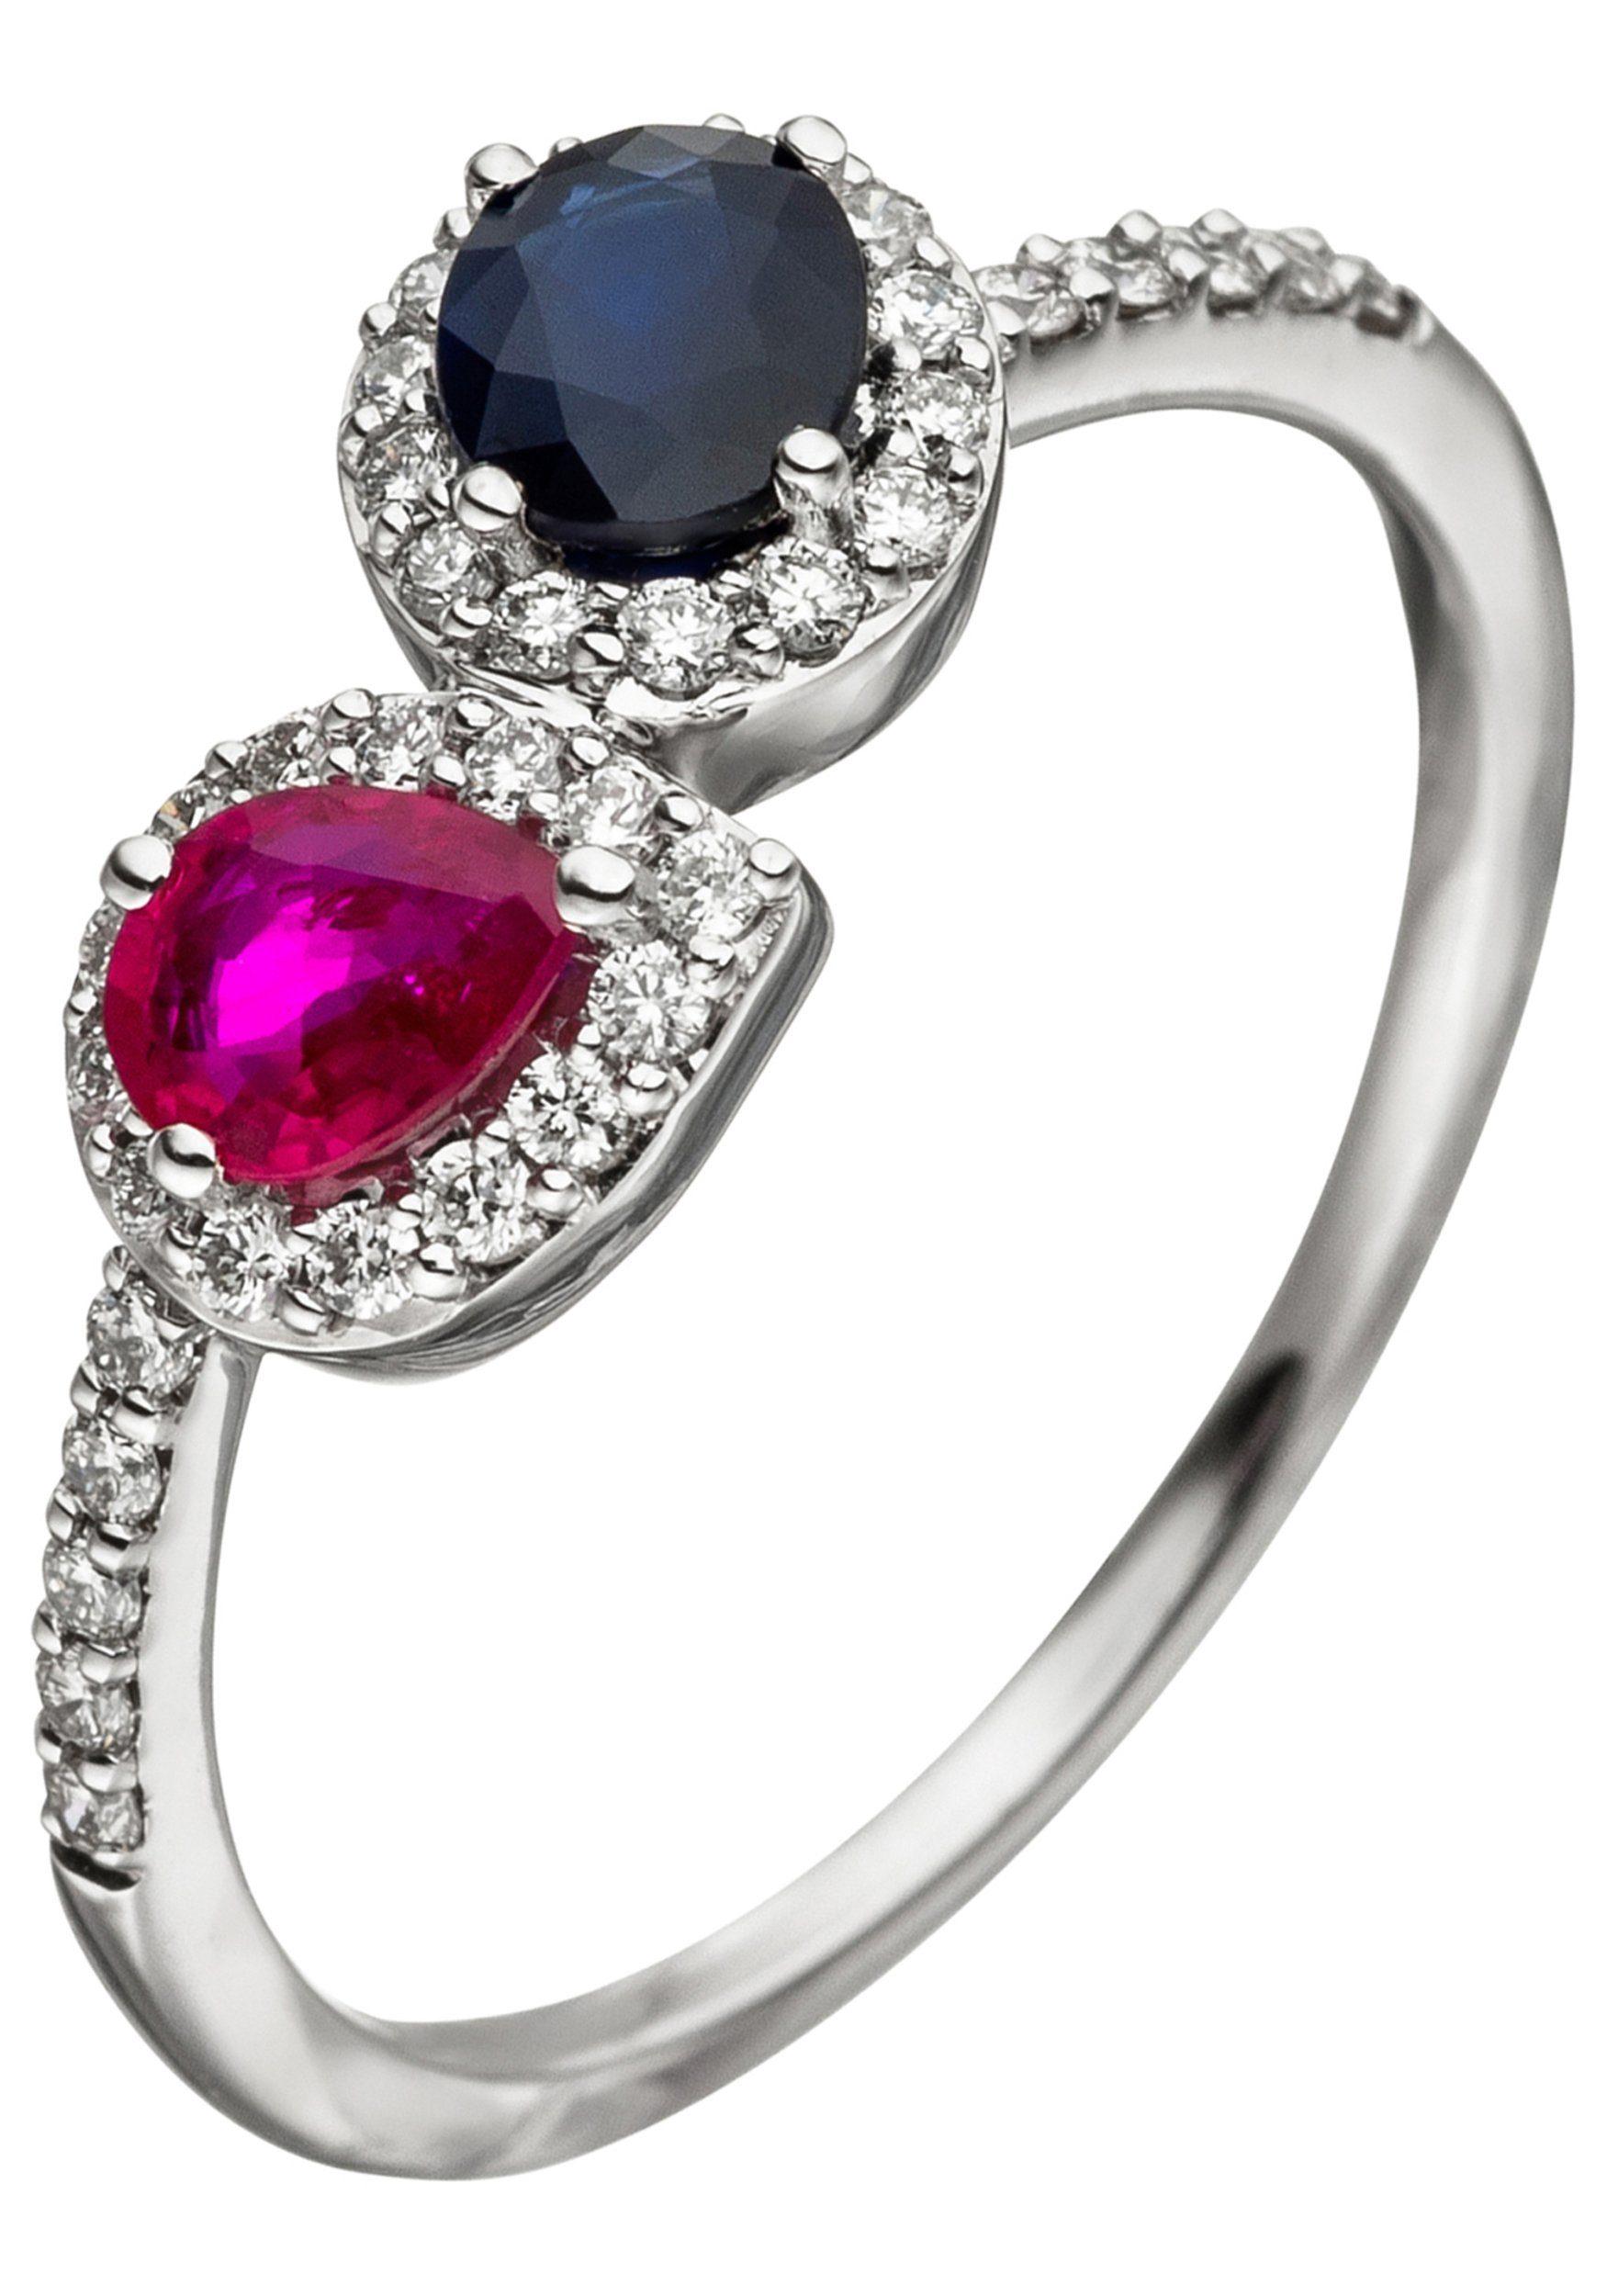 JOBO Diamantring 585 Weigold mit 38 Diamanten Rubin Safir